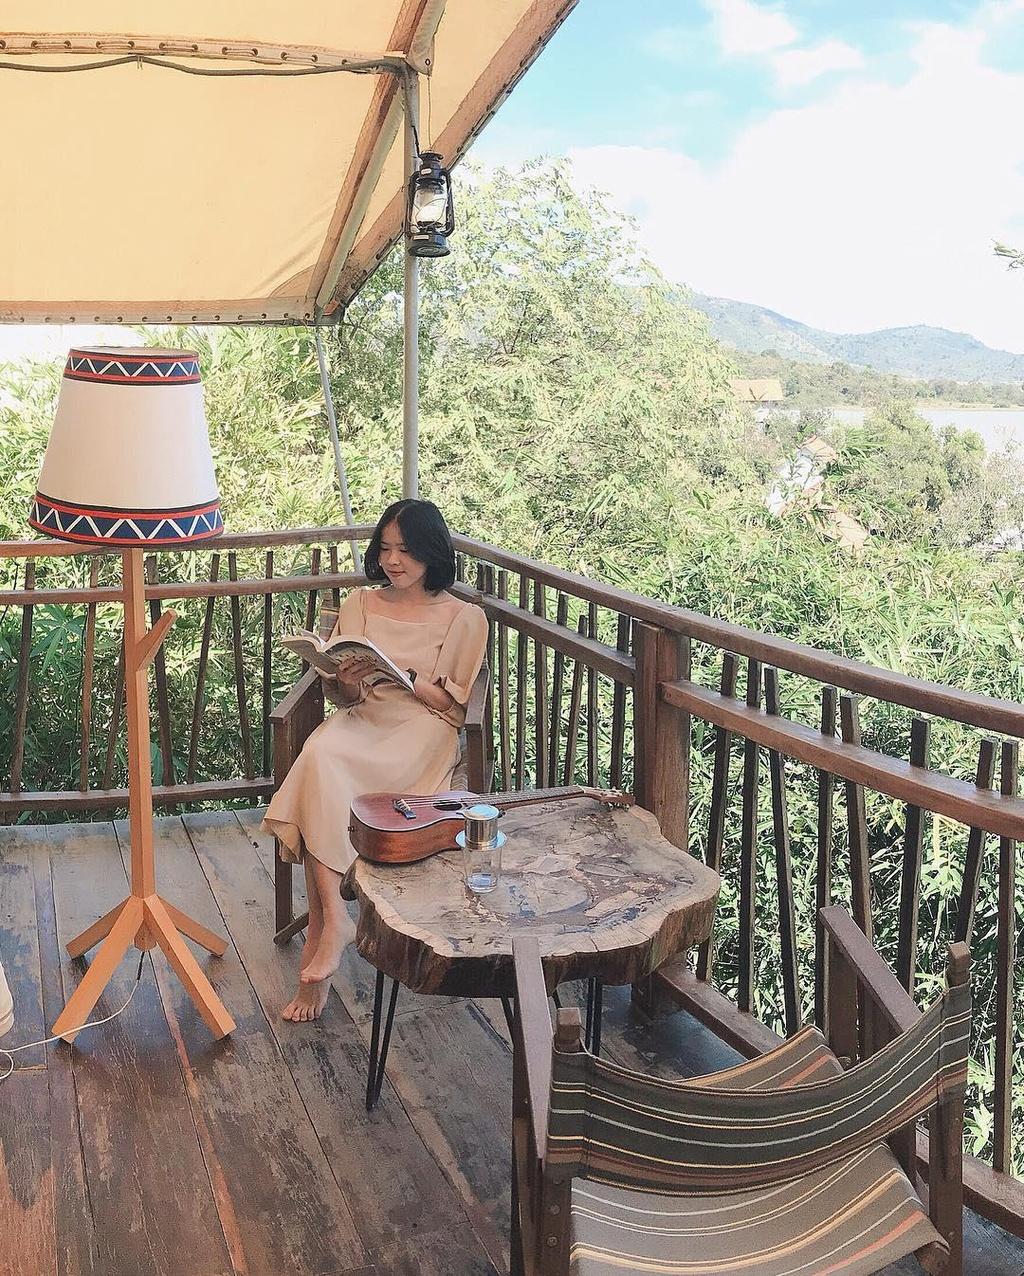 Cam trai kieu 'chanh sa' tai resort giua long rung nui Tay Nguyen hinh anh 1